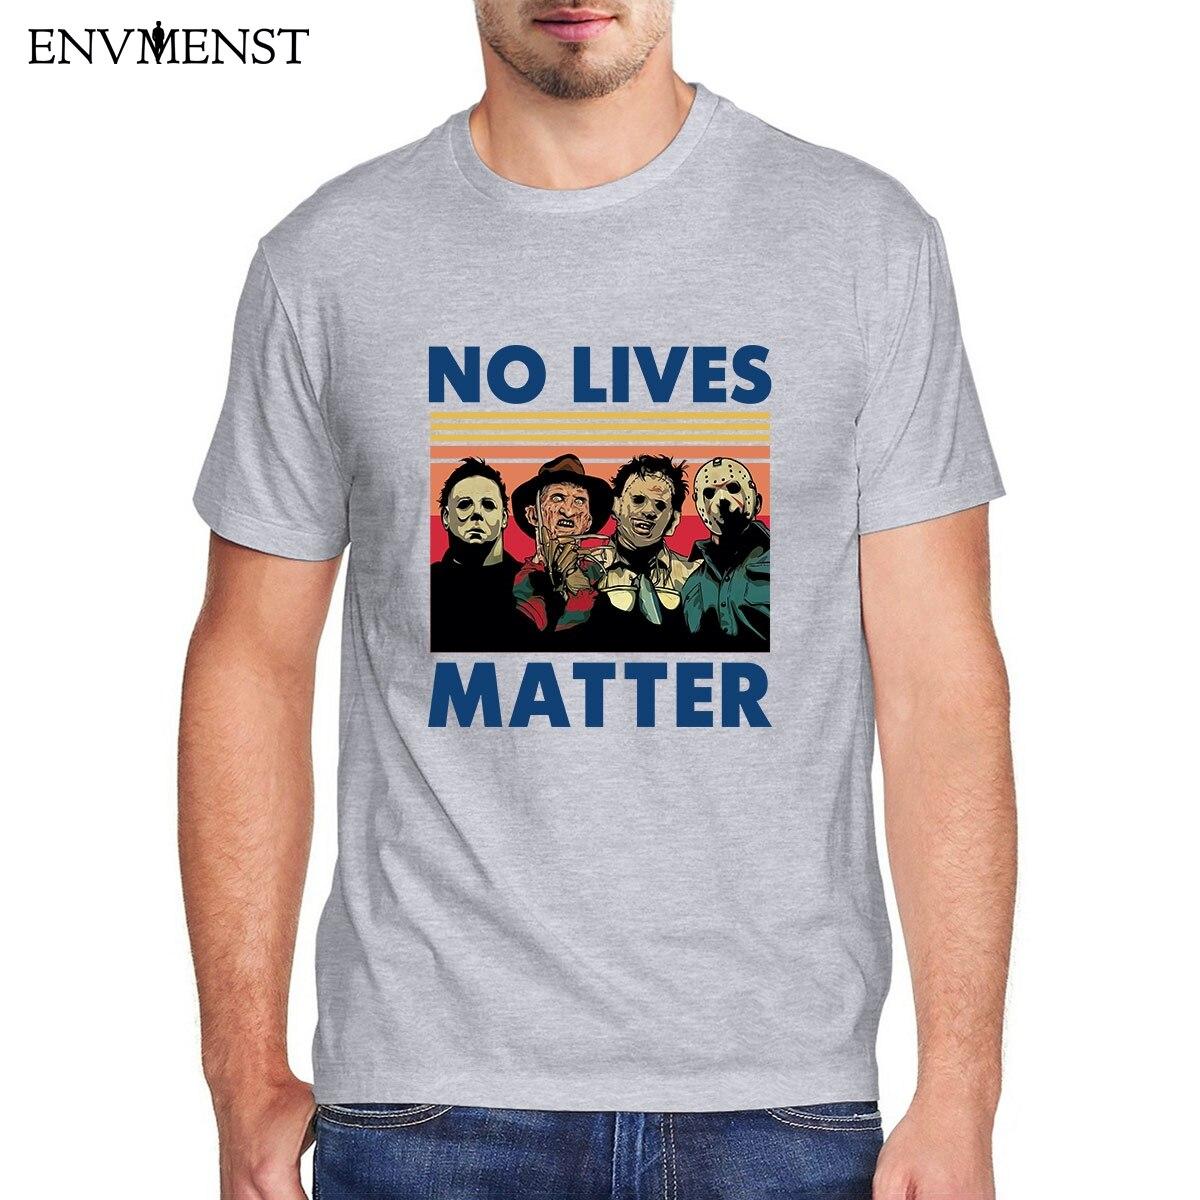 aliexpress - Envmenst t shirt men 100 cotton casual horror no lives matter men clothing oversize sweatshirt tops off white T-shirt XS-3XL